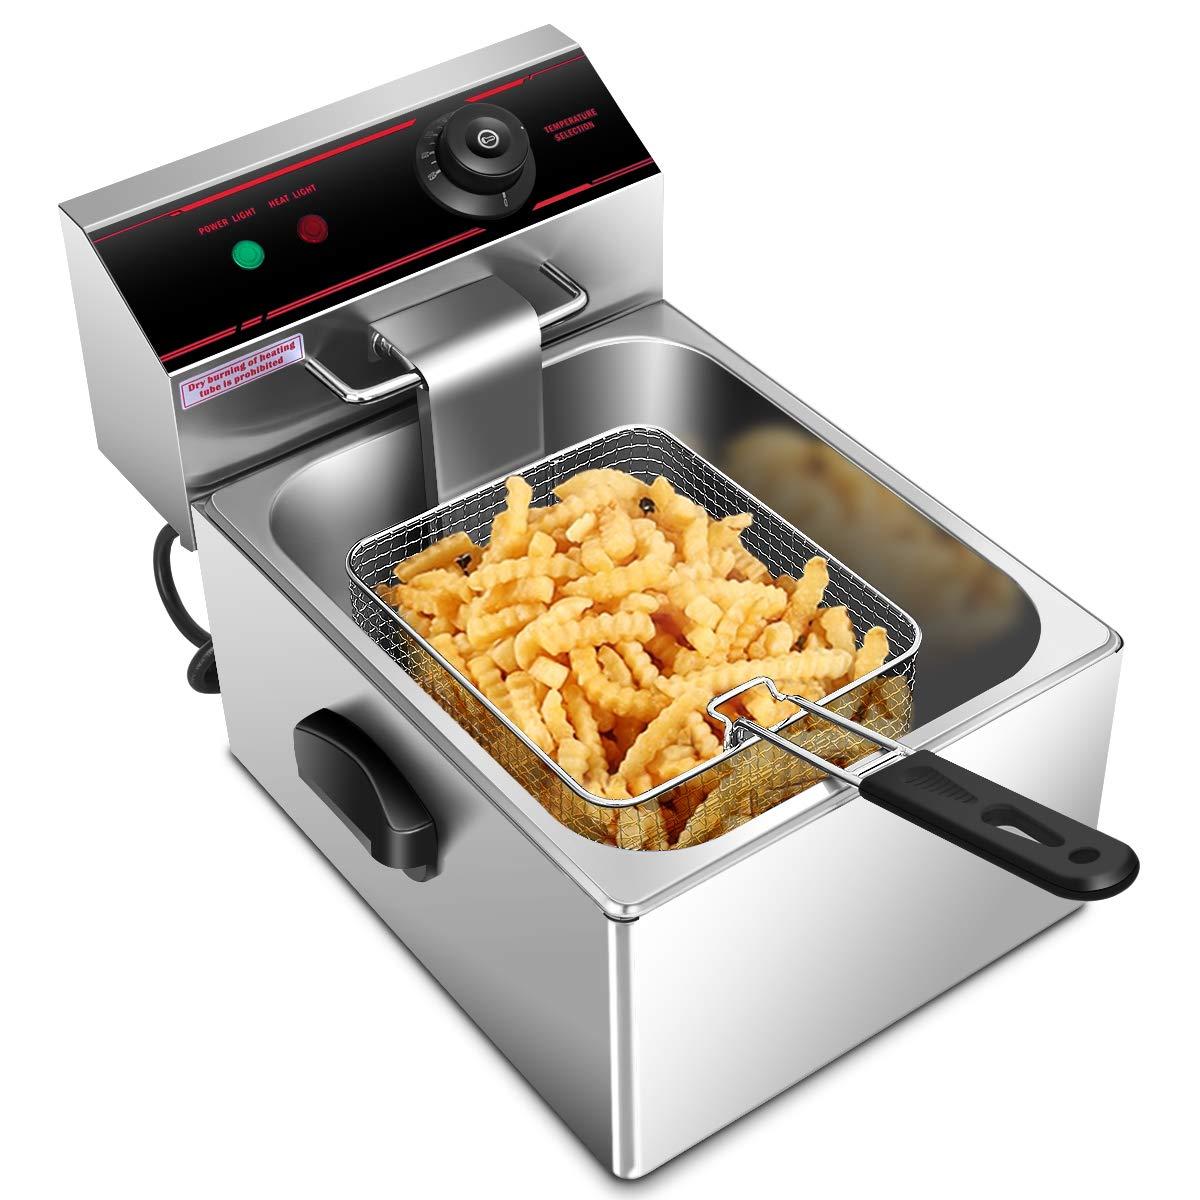 Giantex 2500w Deep Fryer Electric Commercial Countertop Fryer Restaurant Kitchen Frying 6L Single Tank w/Fryer Basket Scoop Professional Grade